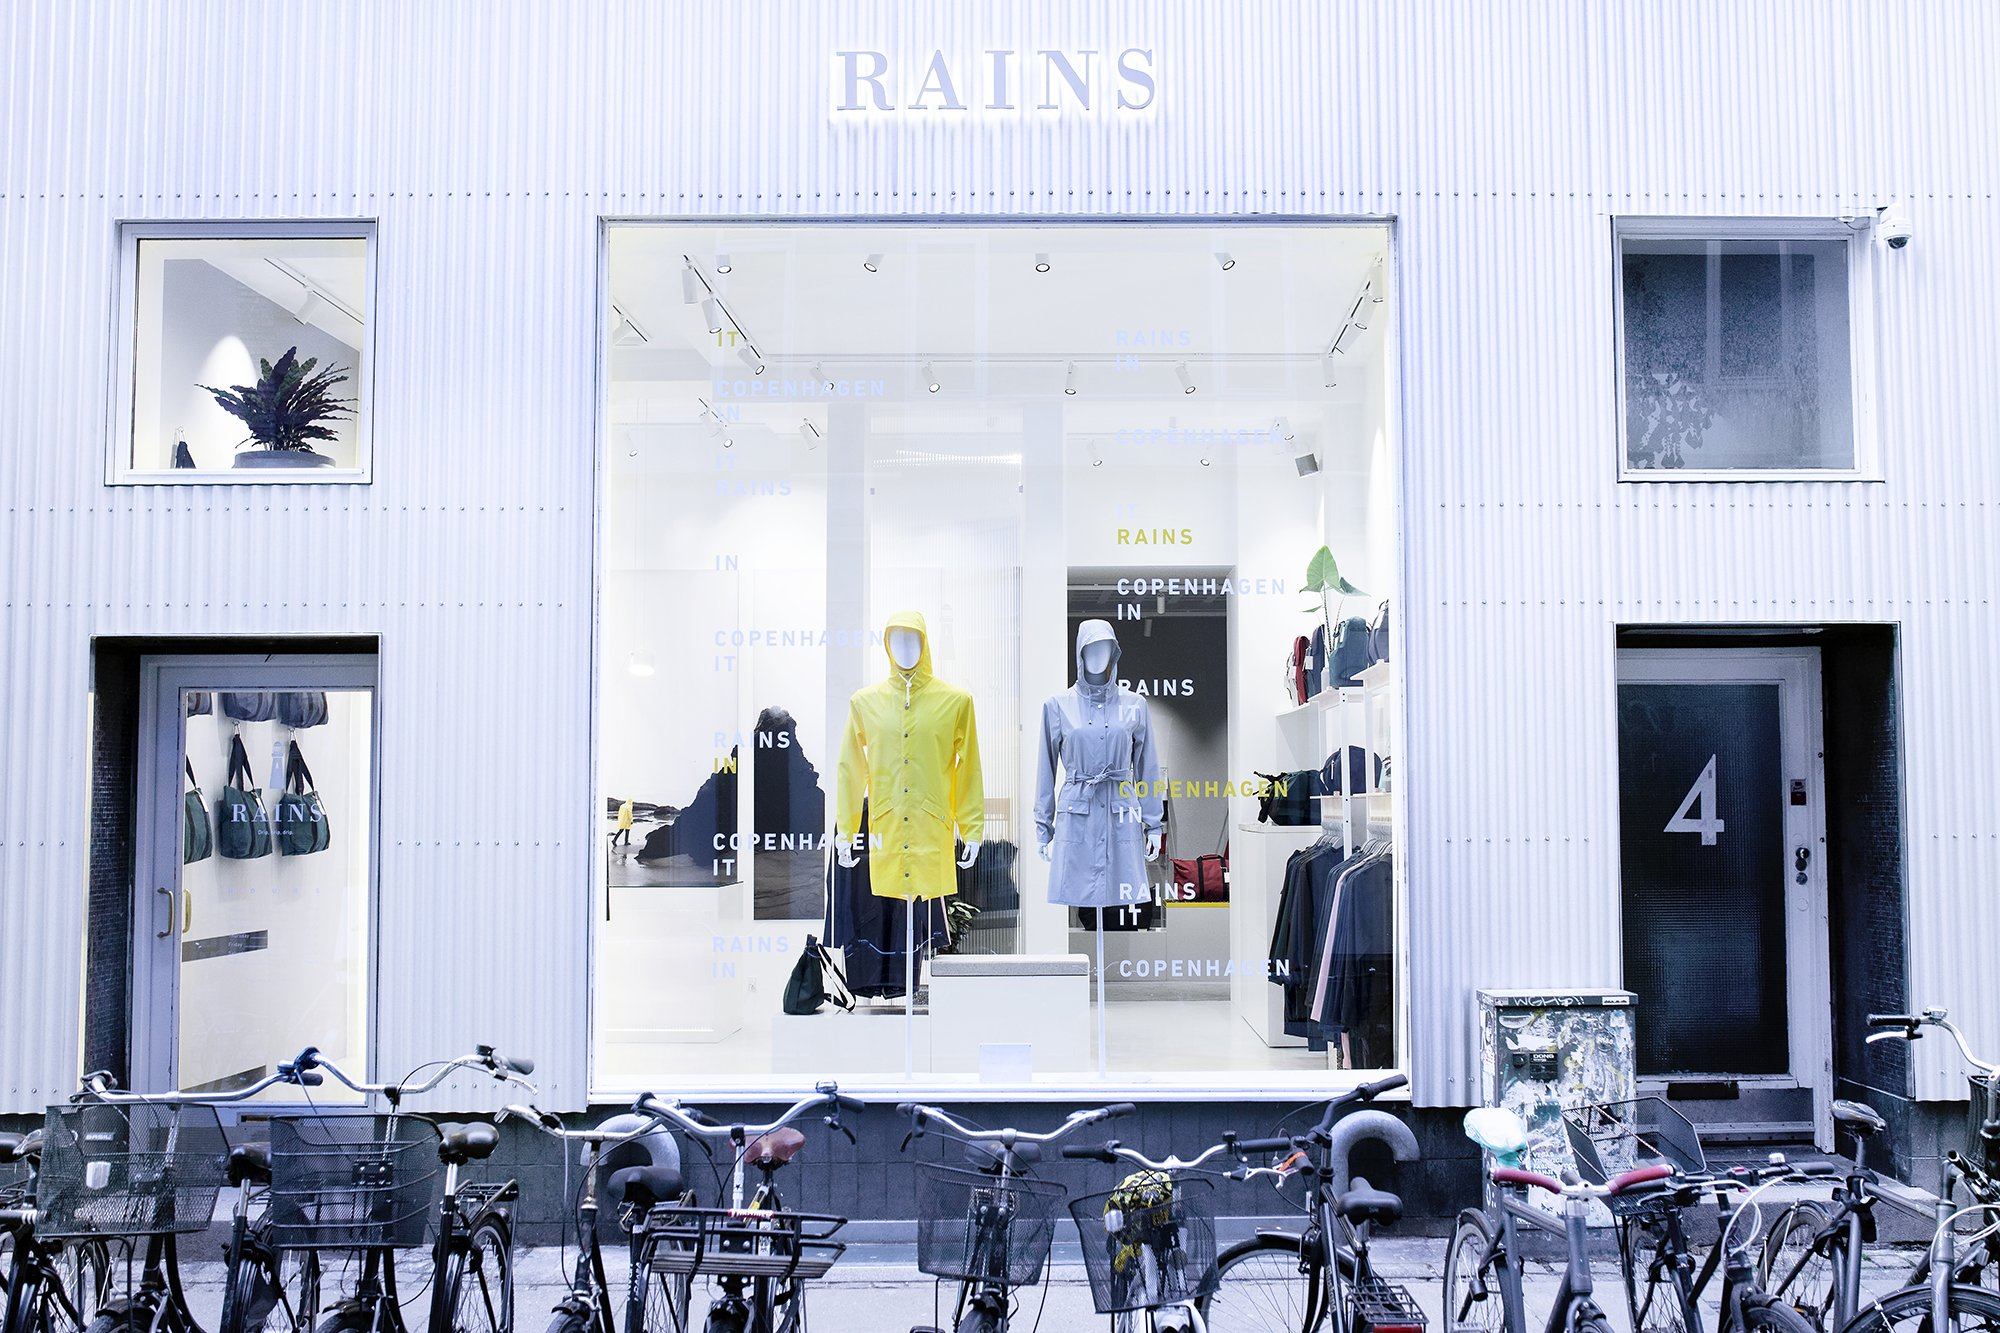 RAINS Store Copenhagen